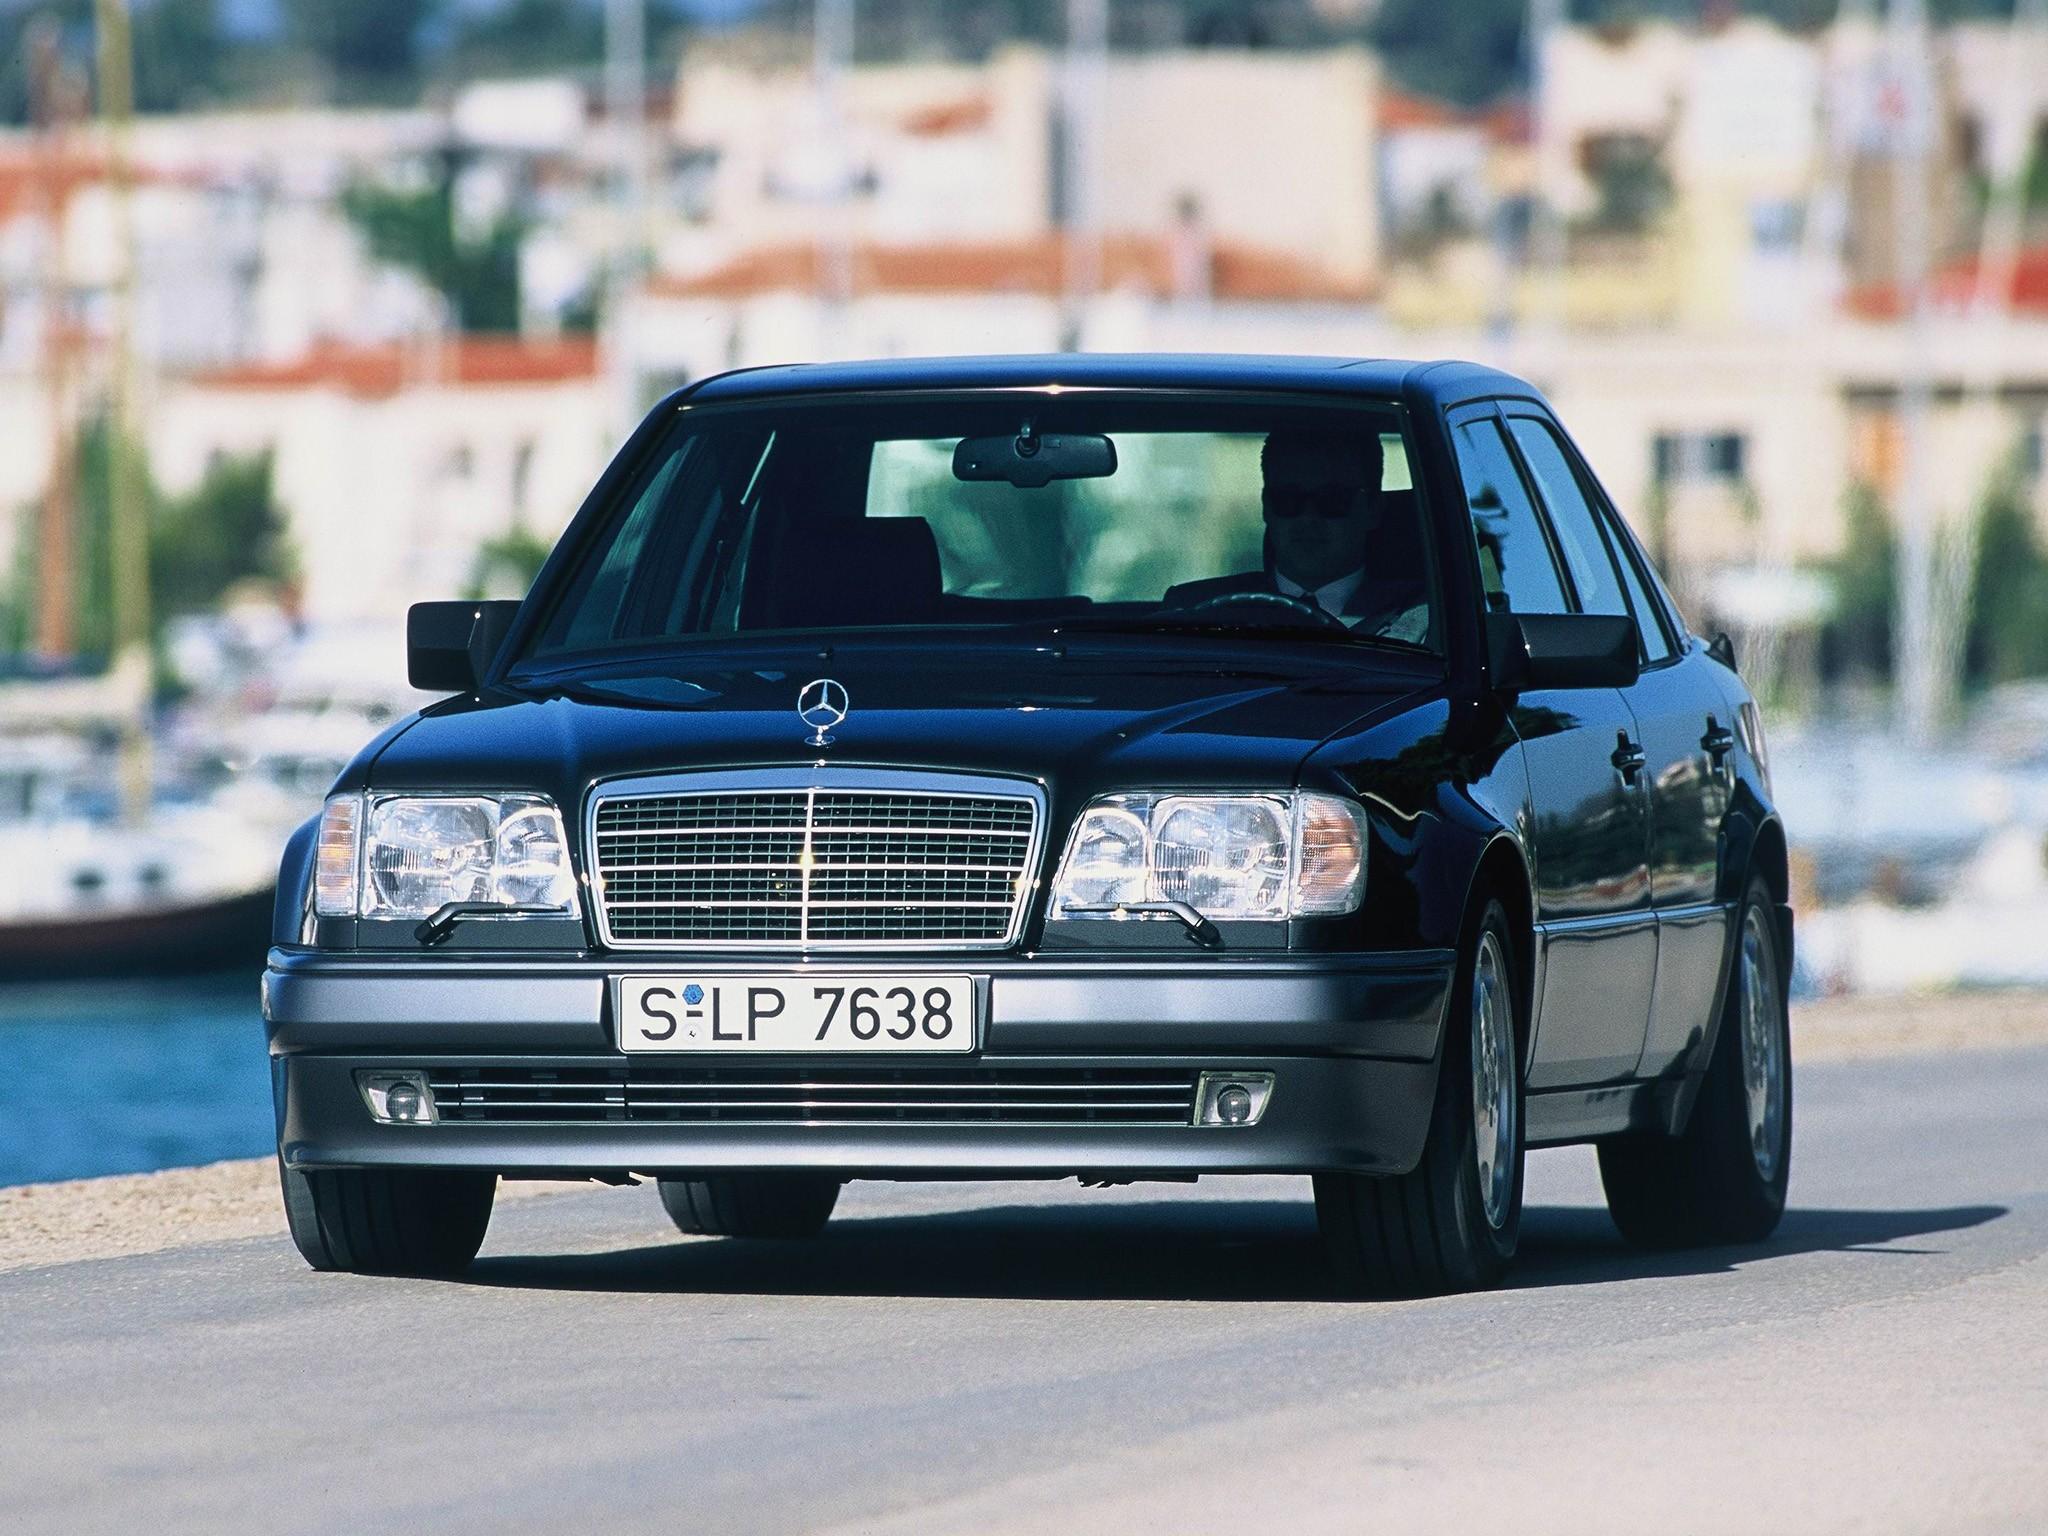 Mercedesbenzsl R moreover Mercedesbenzsl R moreover Mercedes Benz Sl Class R Roadster D in addition Mercedesbenzsl Amg R also Mercedesbenzsl Klasse R. on mercedes sl 500 hp